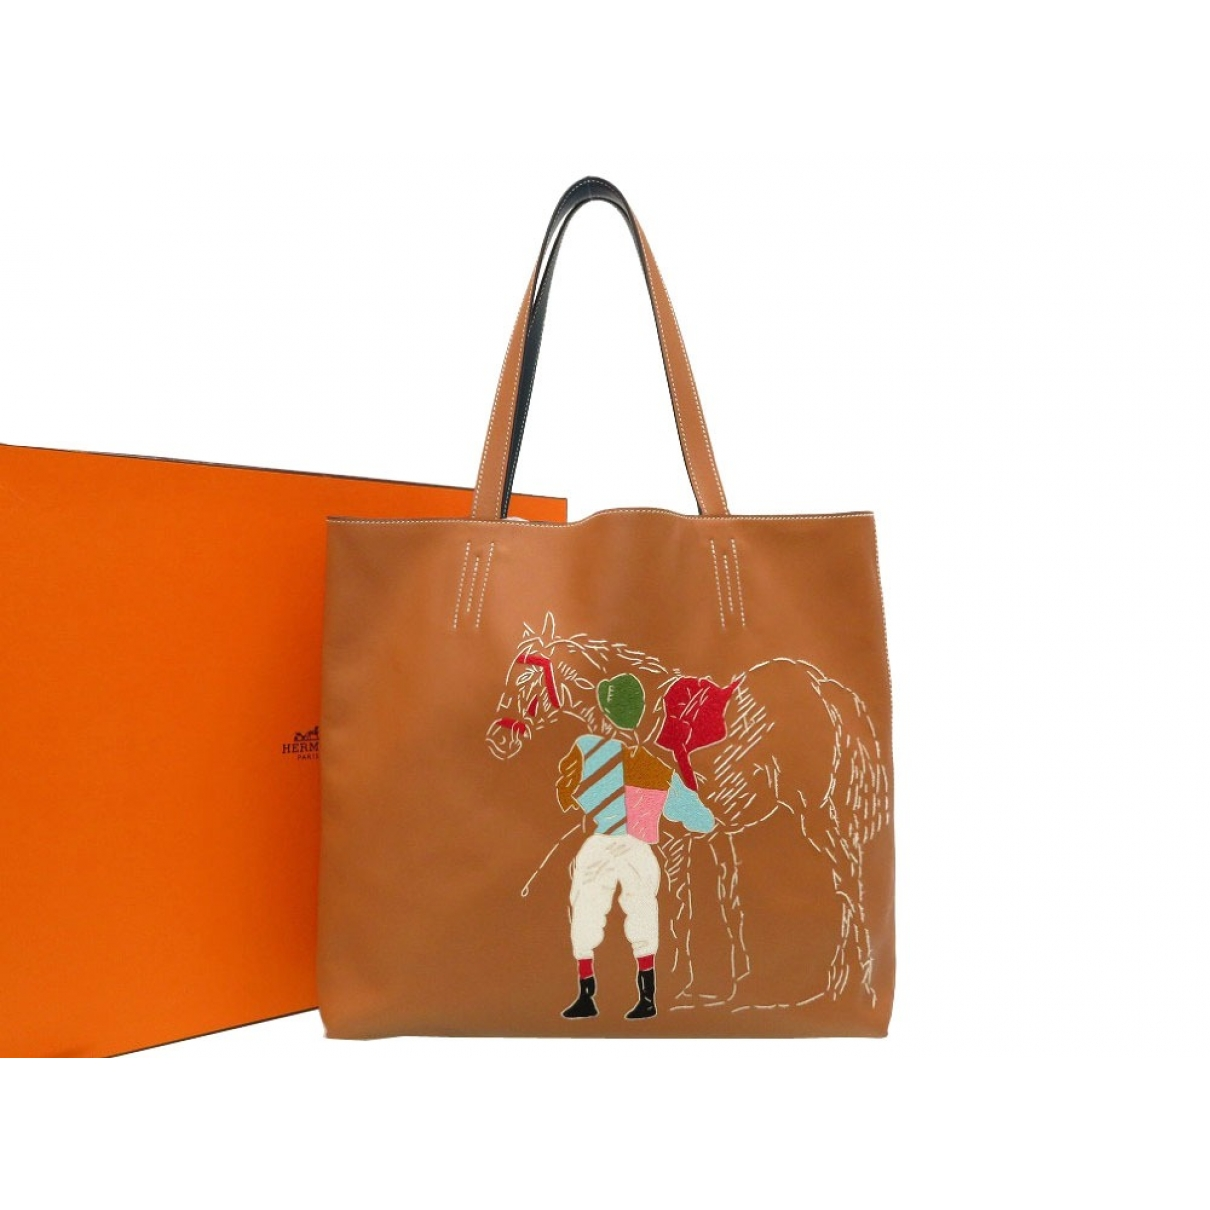 Hermes \N Handtasche in  Braun Leder